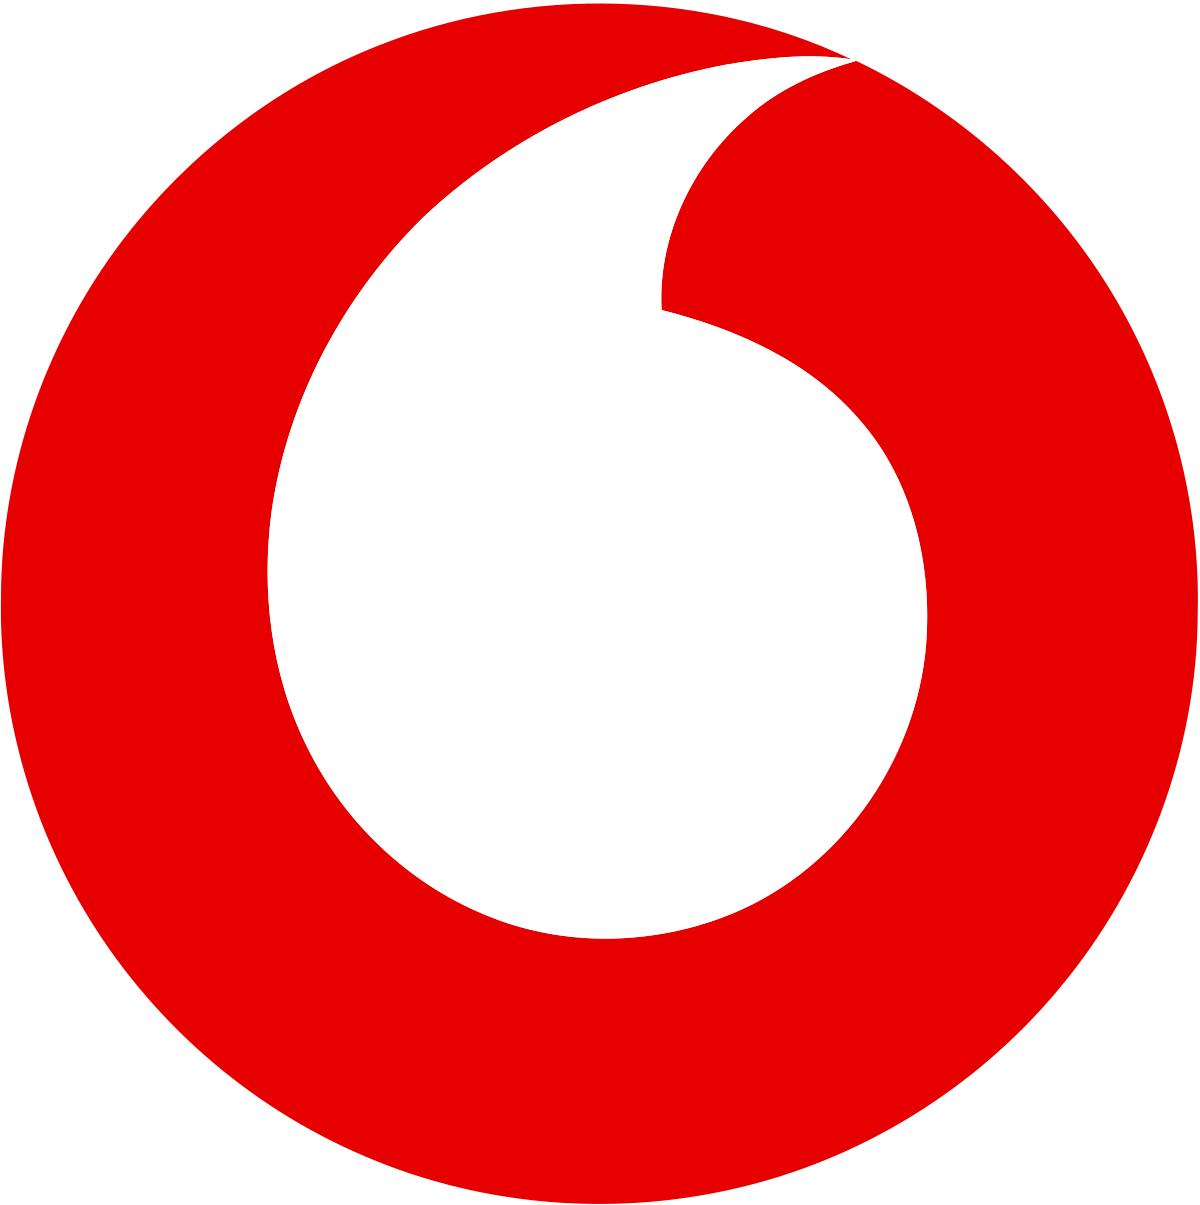 Vodafone DSL 16, 50, 100, 250 inkl. FRITZ!Box 7530 (Leihgerät) PLUS 2x FRITZ!Box 7590 (Eigentum, Wert: 379,98€) für 24,99€, 27,49€, 29,99€, 34,99€ mtl. *UPDATE*